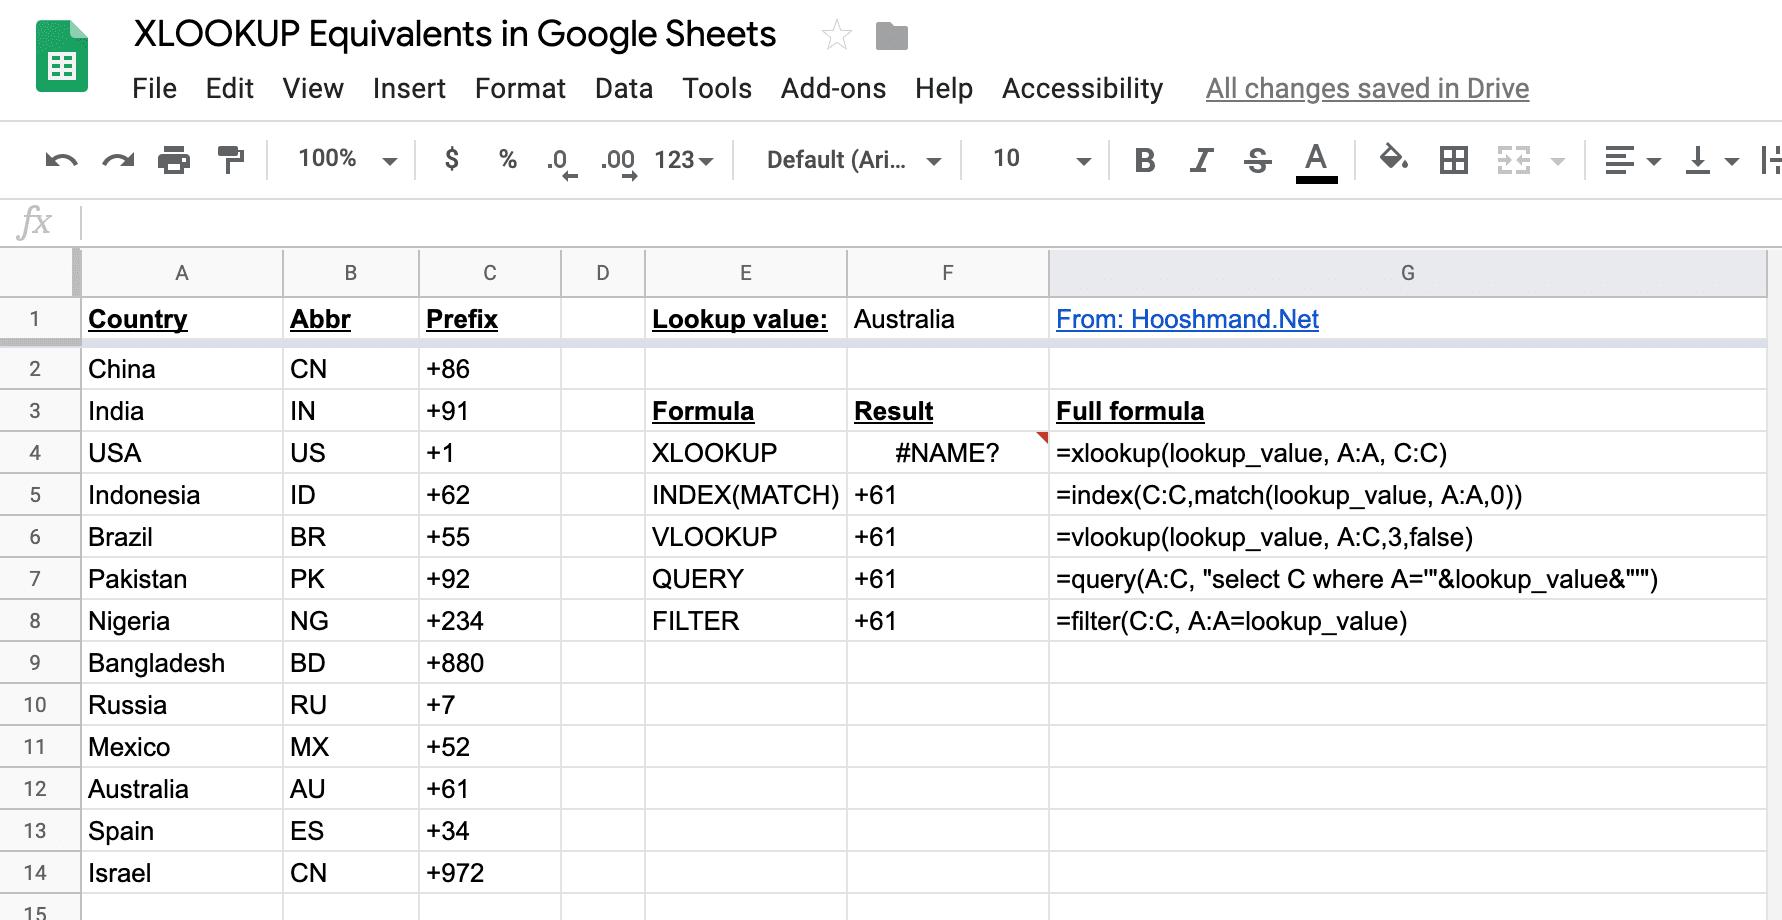 Google Sheets - XLOOKUP equivalents demonstrated